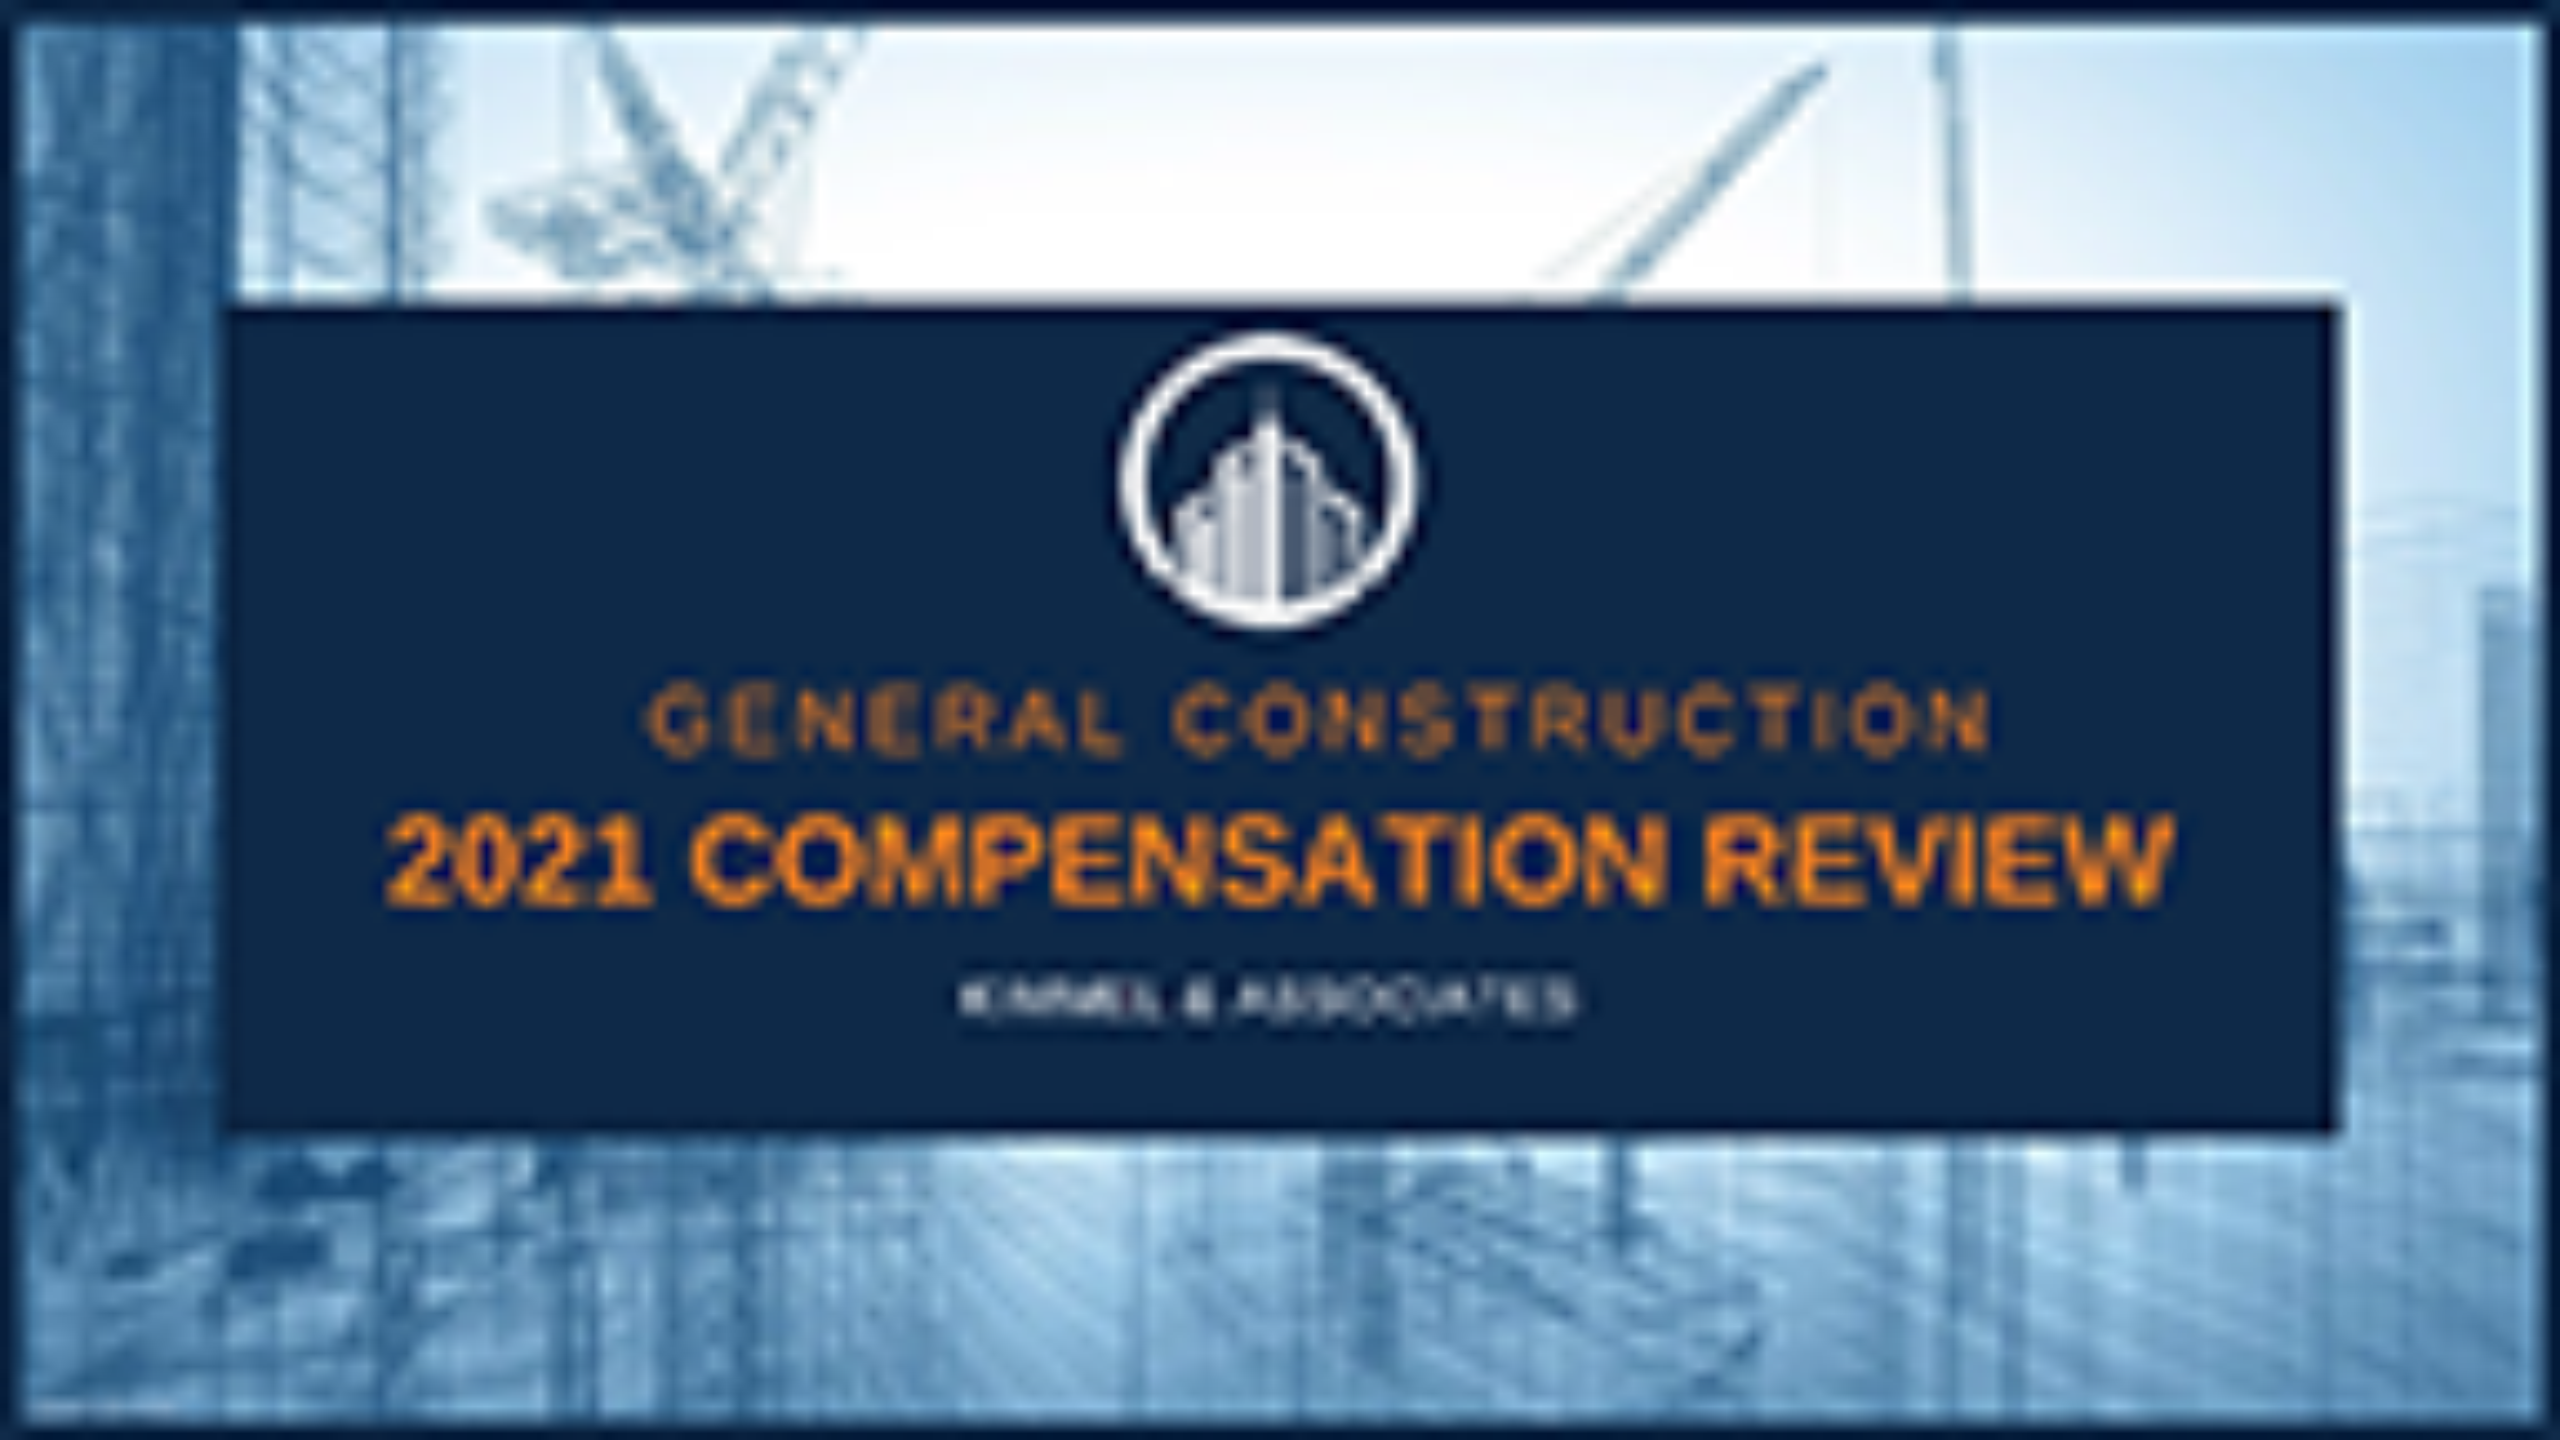 General Construction Compensation Review